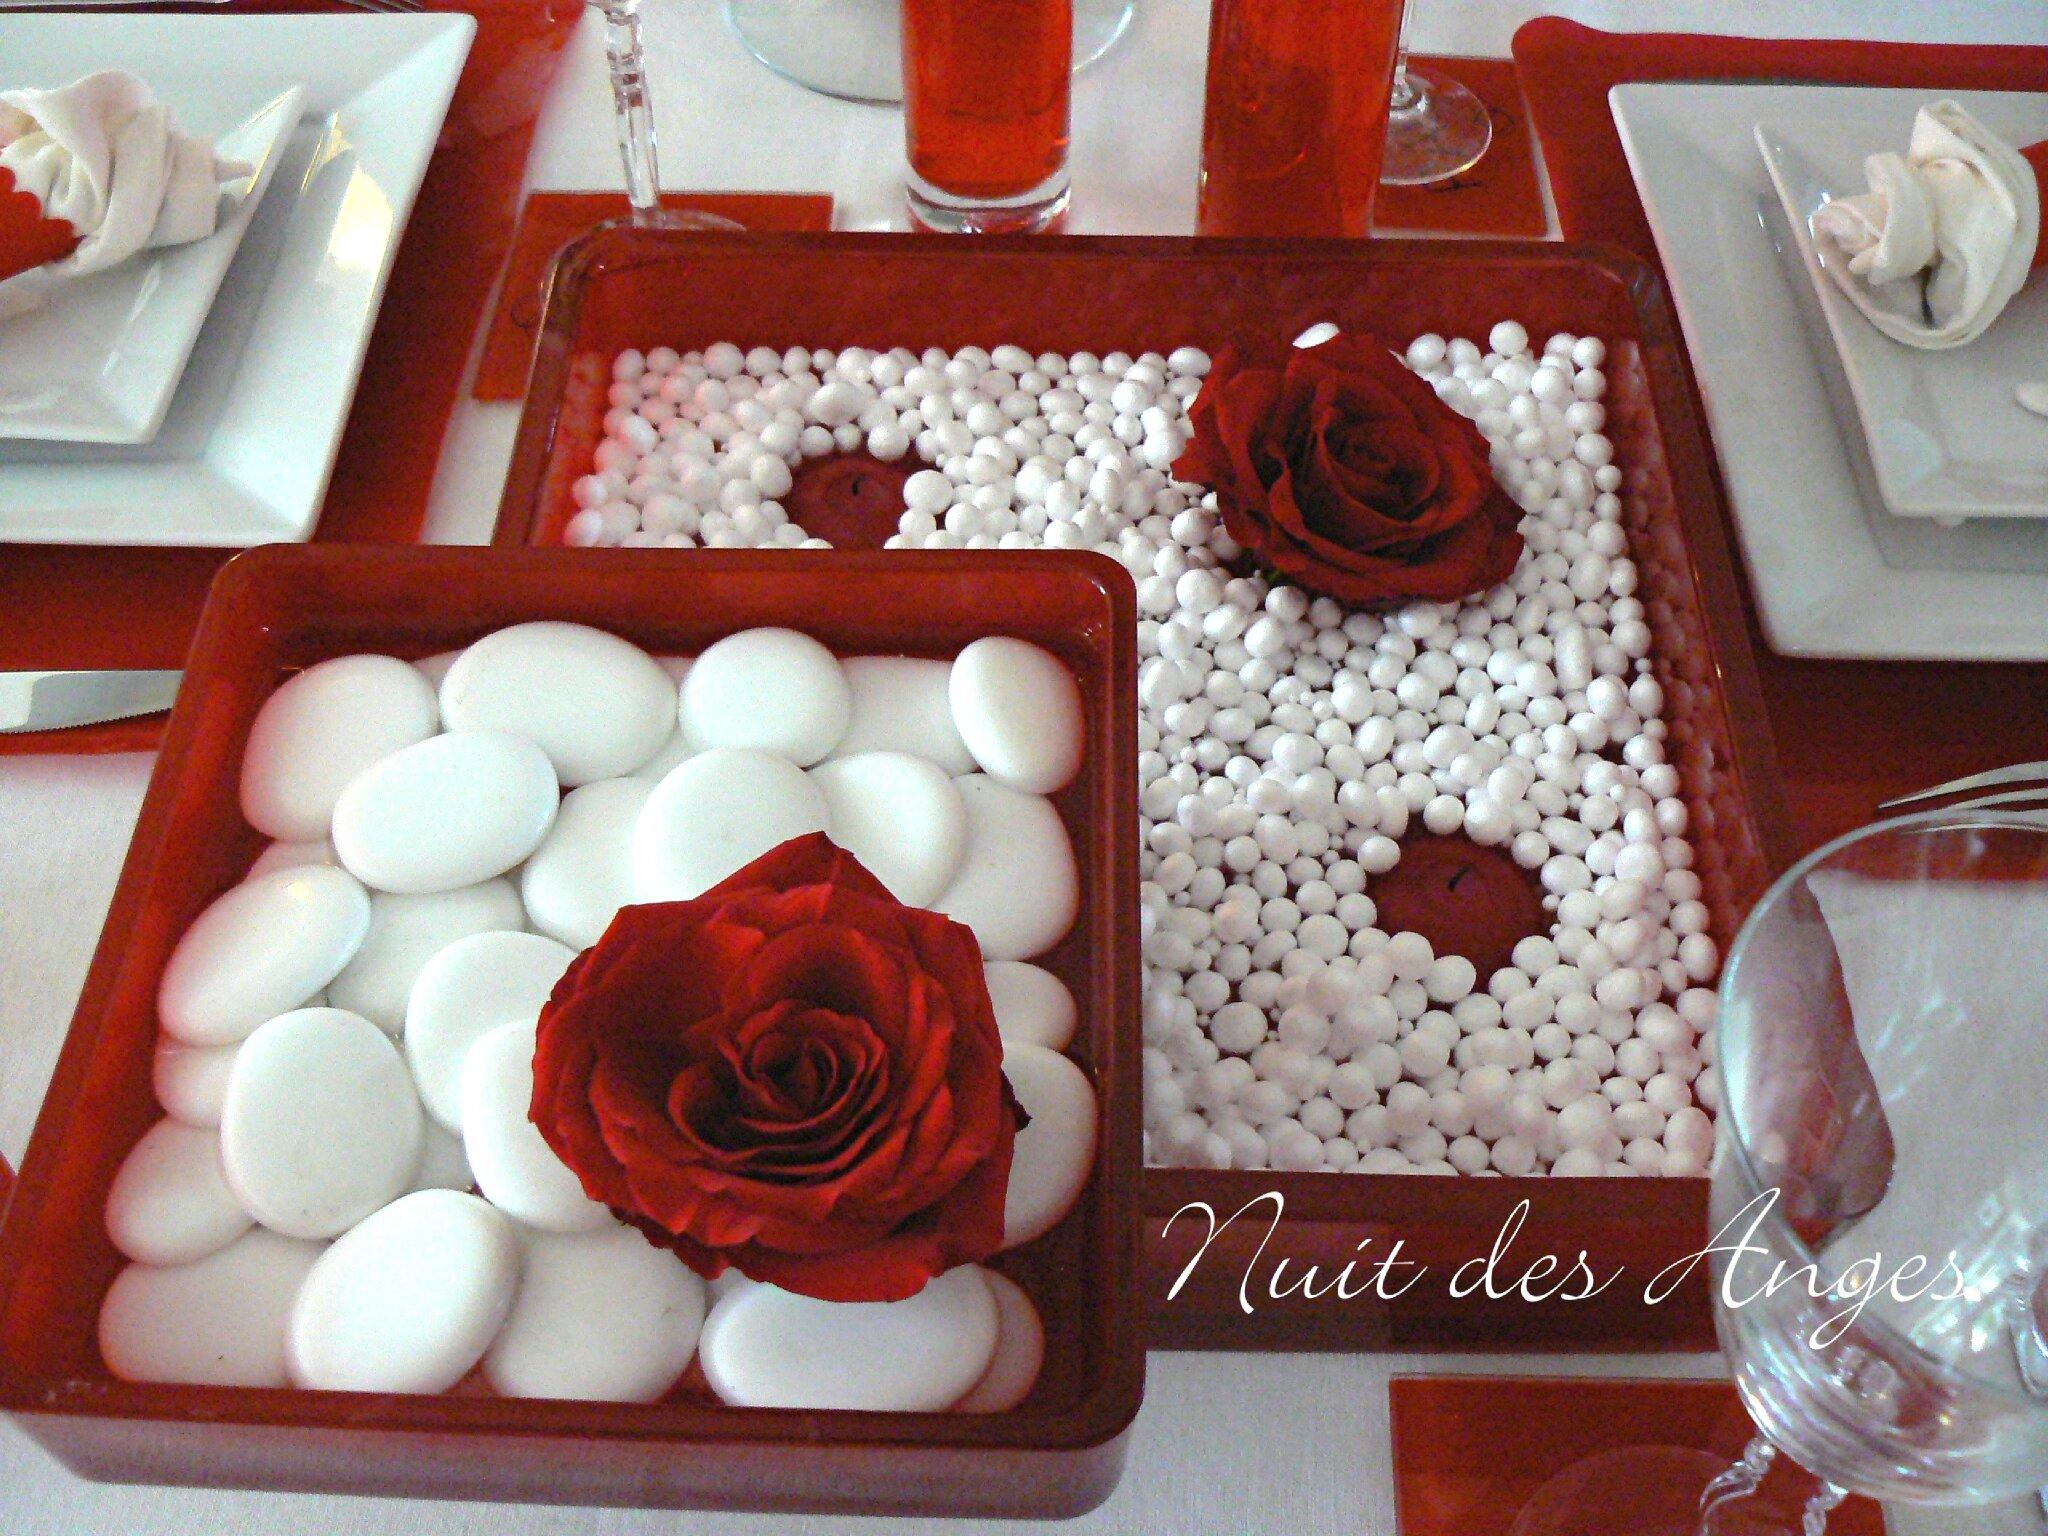 Idee deco cuisine rouge et blanc - Deco rouge et blanc ...